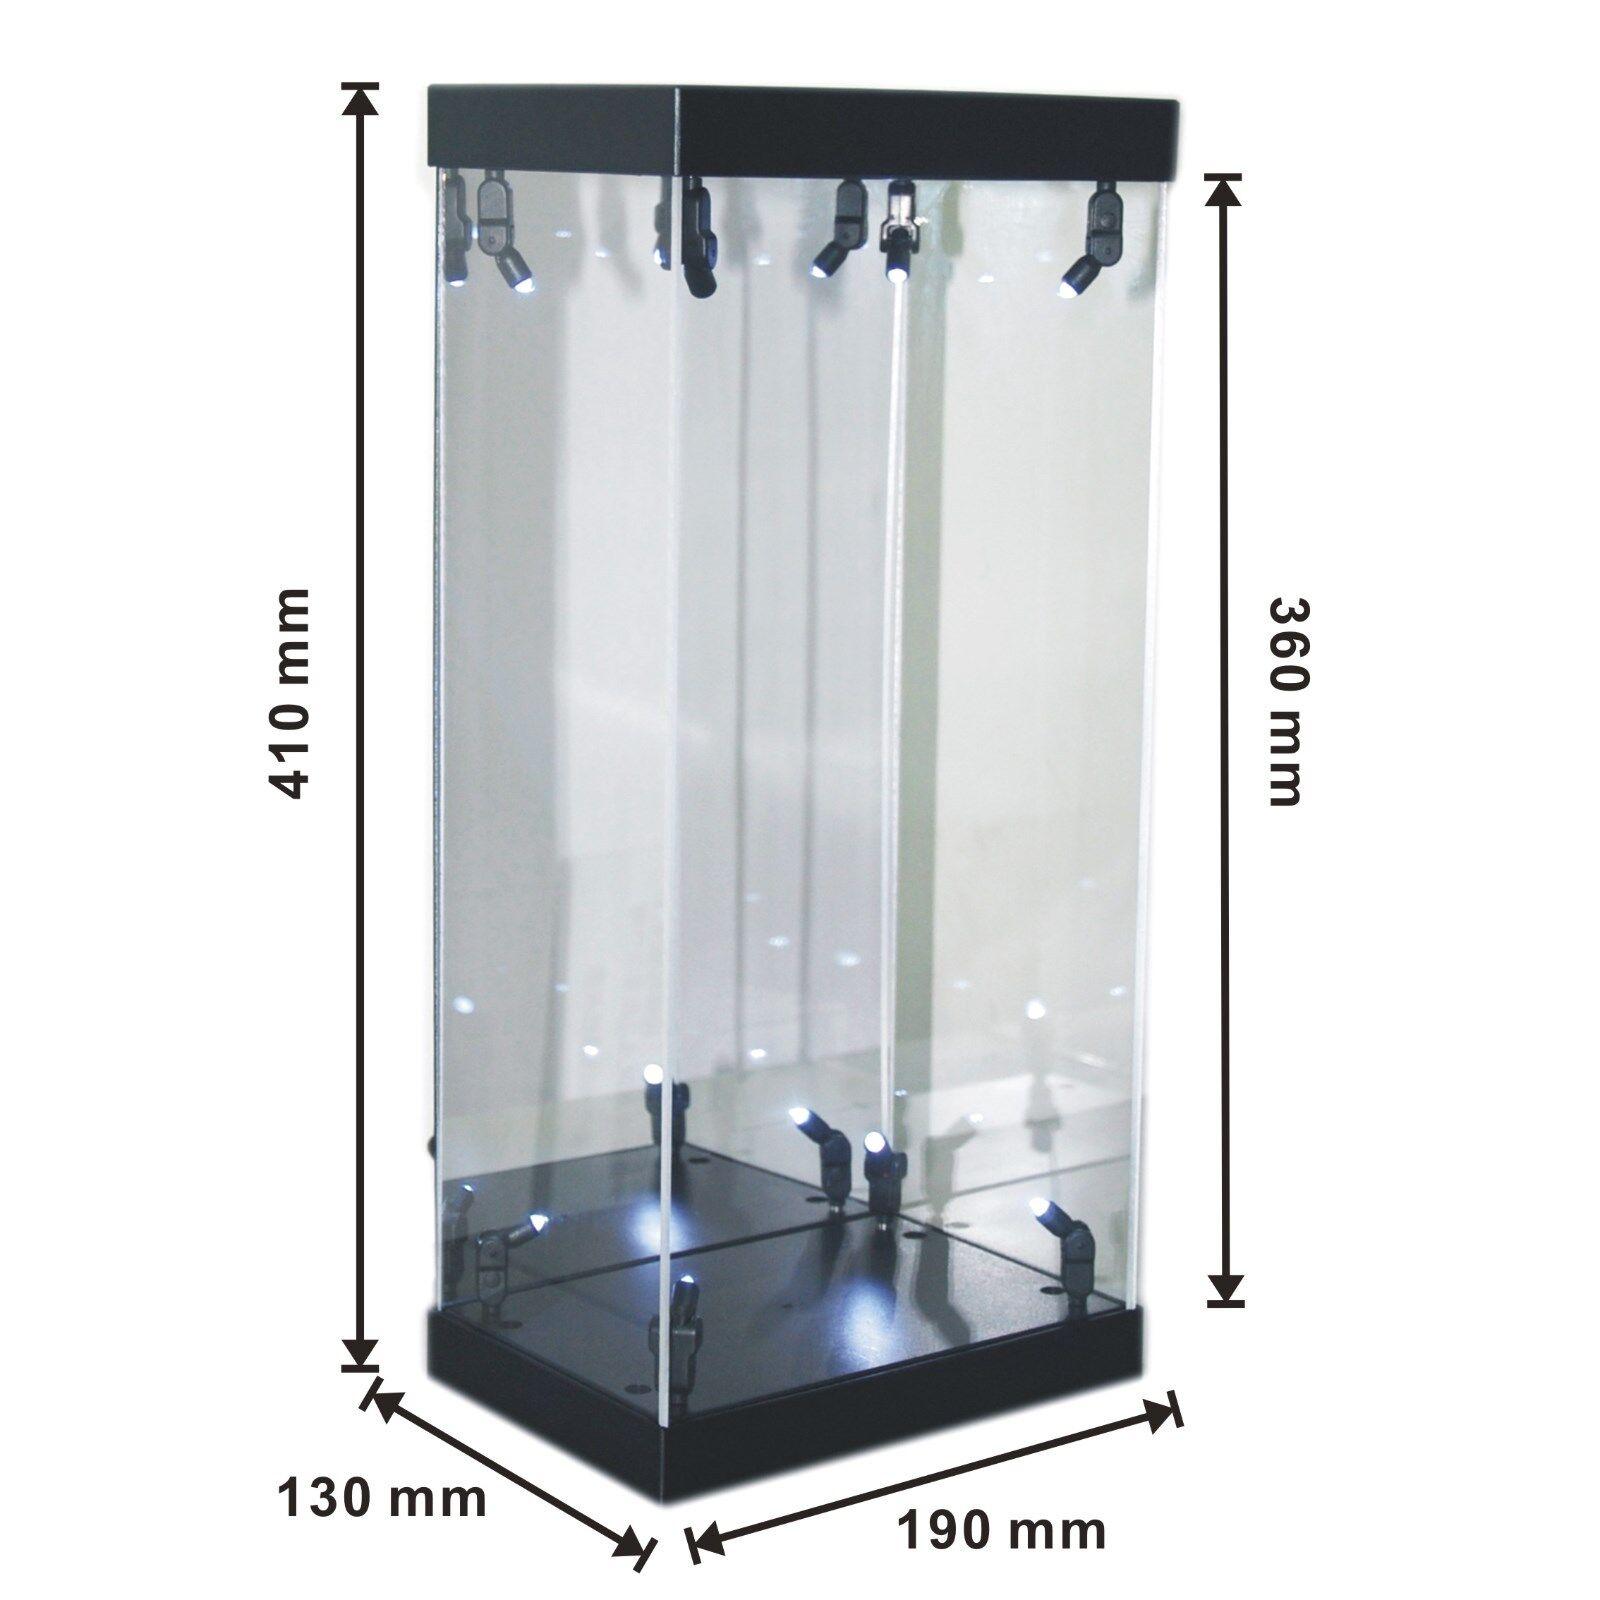 Caso de exhibición de acrílico Caja de Luz LED Para 12  1 6th escala QUICKplata Figura De Acción